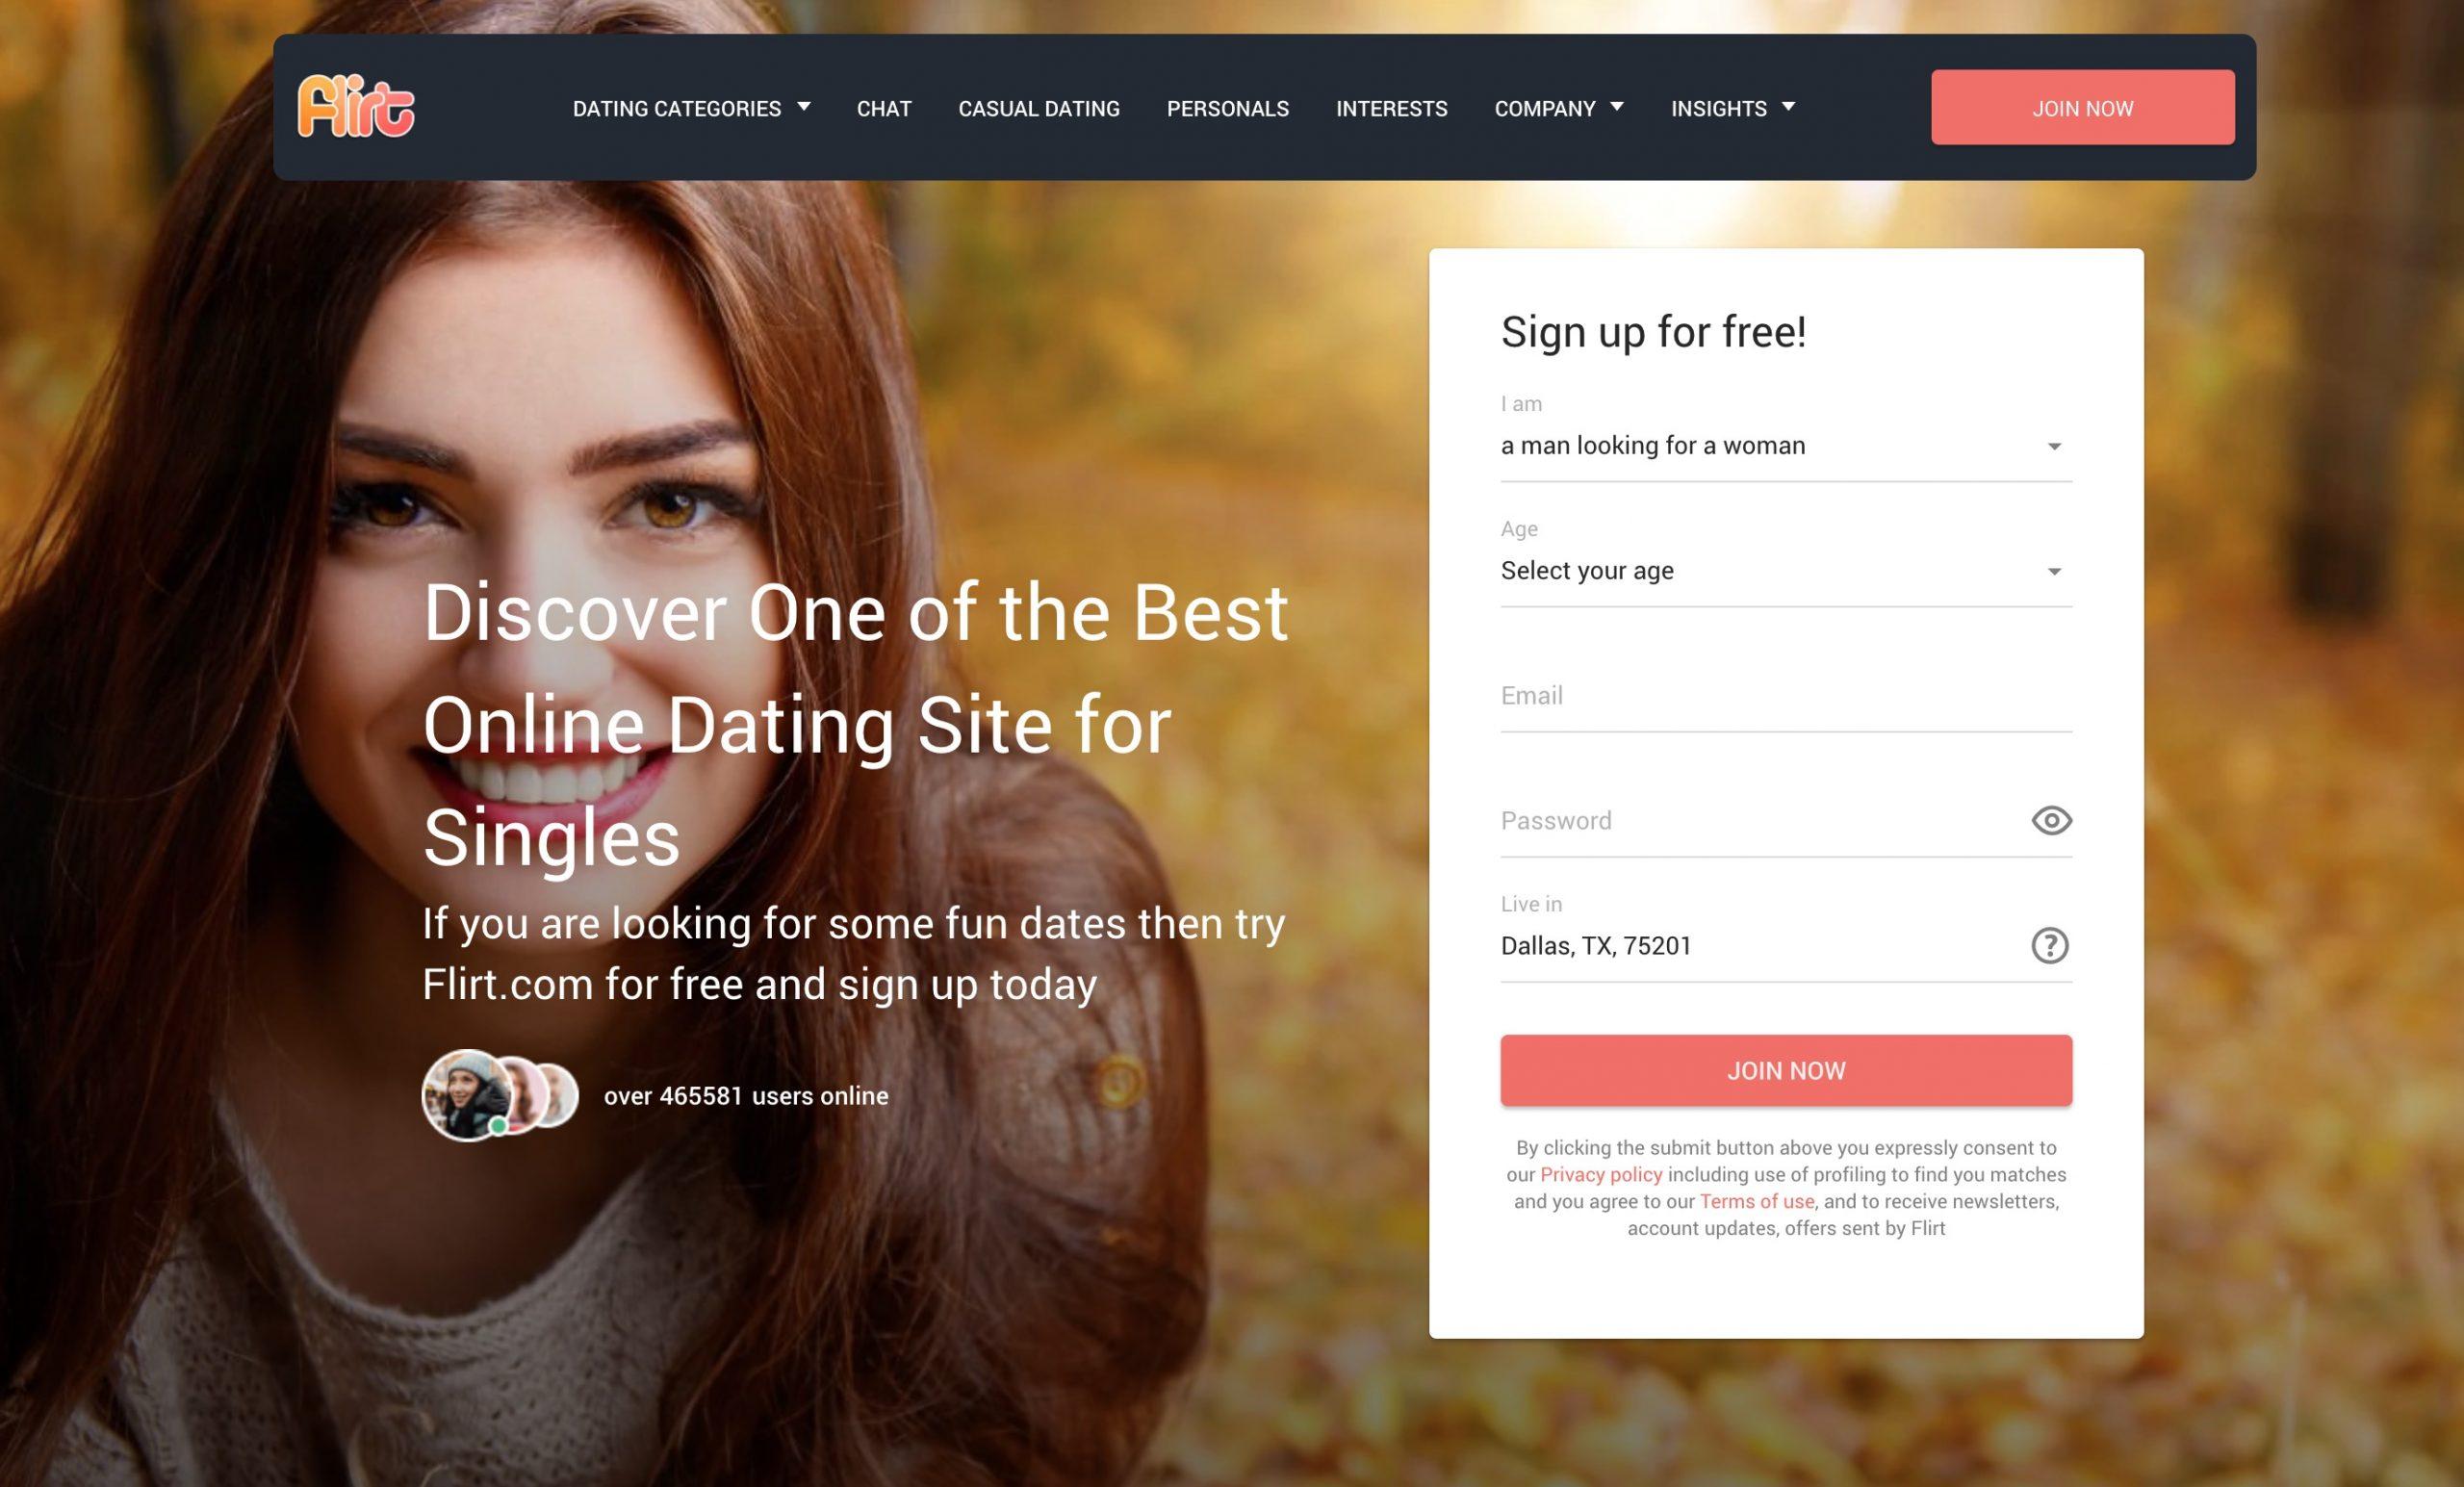 flirt.com main page